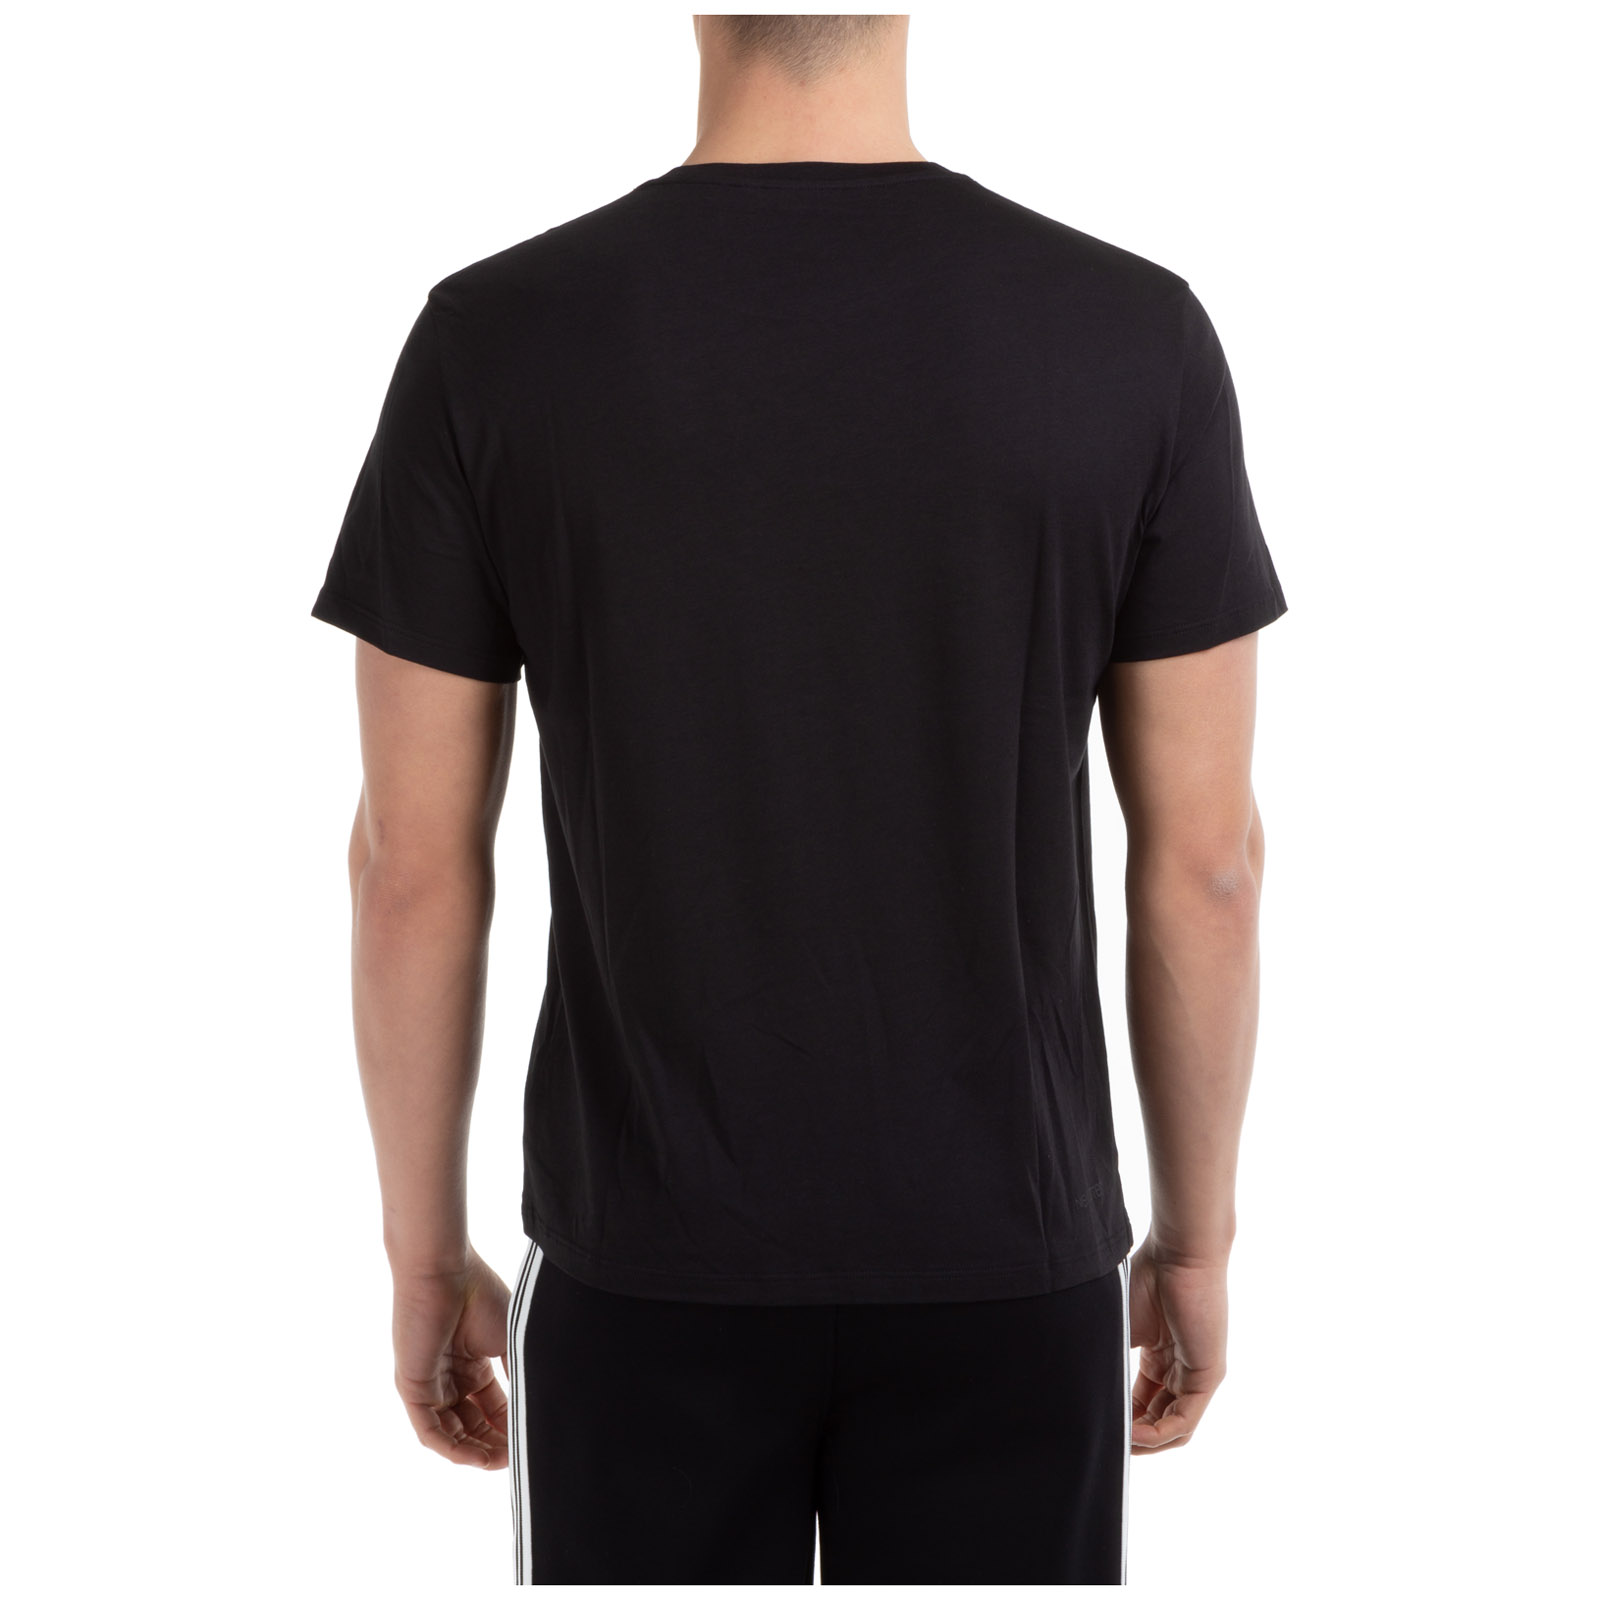 Details about  /Neil Barrett t-shirt men sex education BJT755SN534P 1849 White round collar